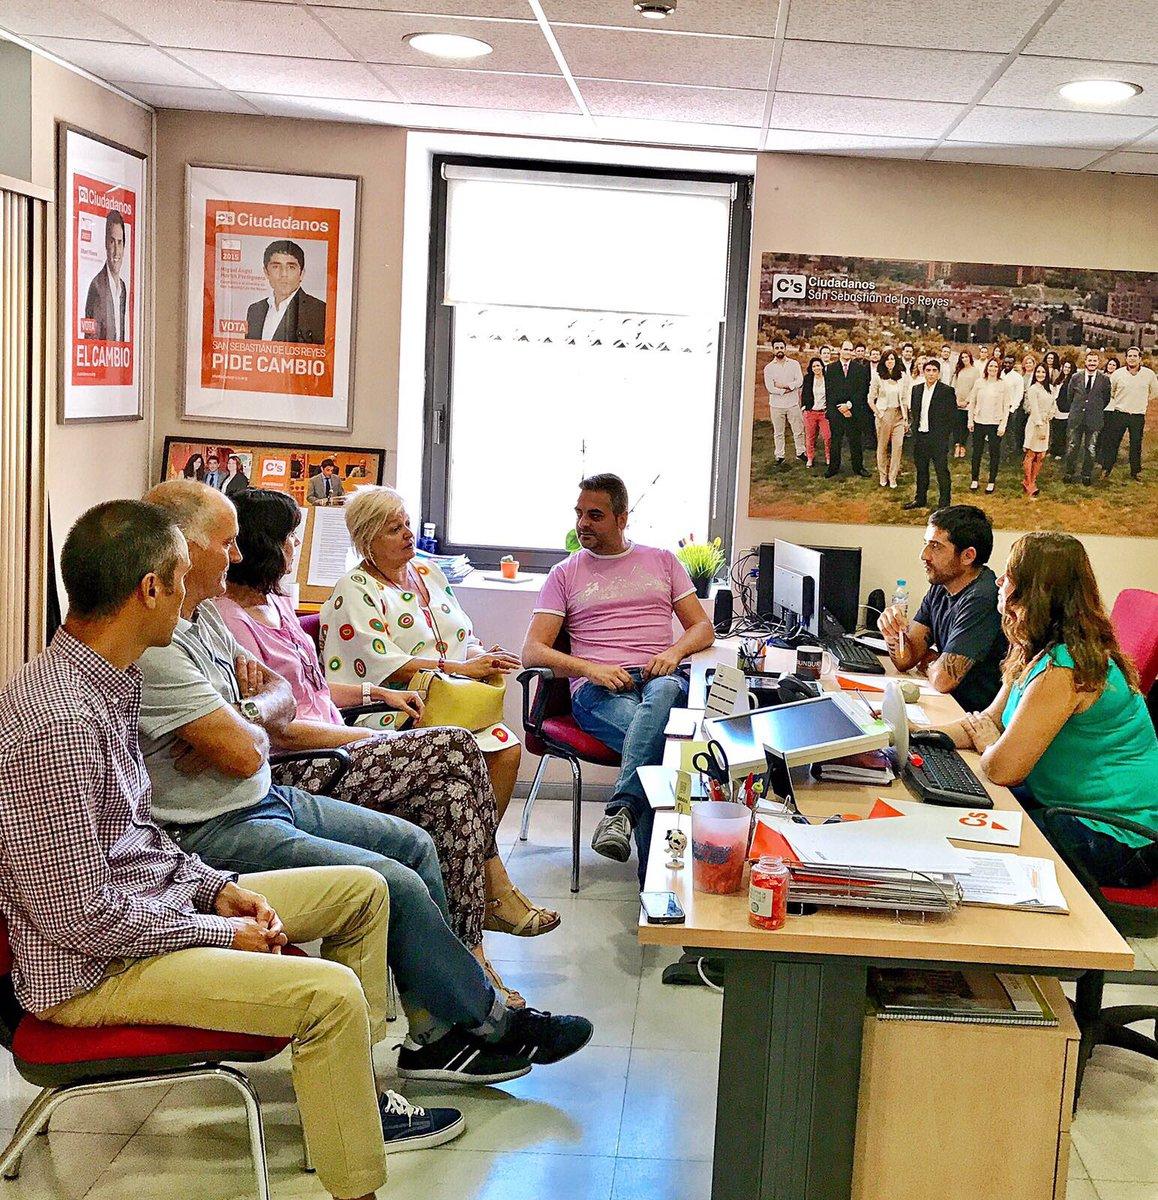 Oficina de empleo san sebastian de los reyes free oficina for Oficina empleo cantabria